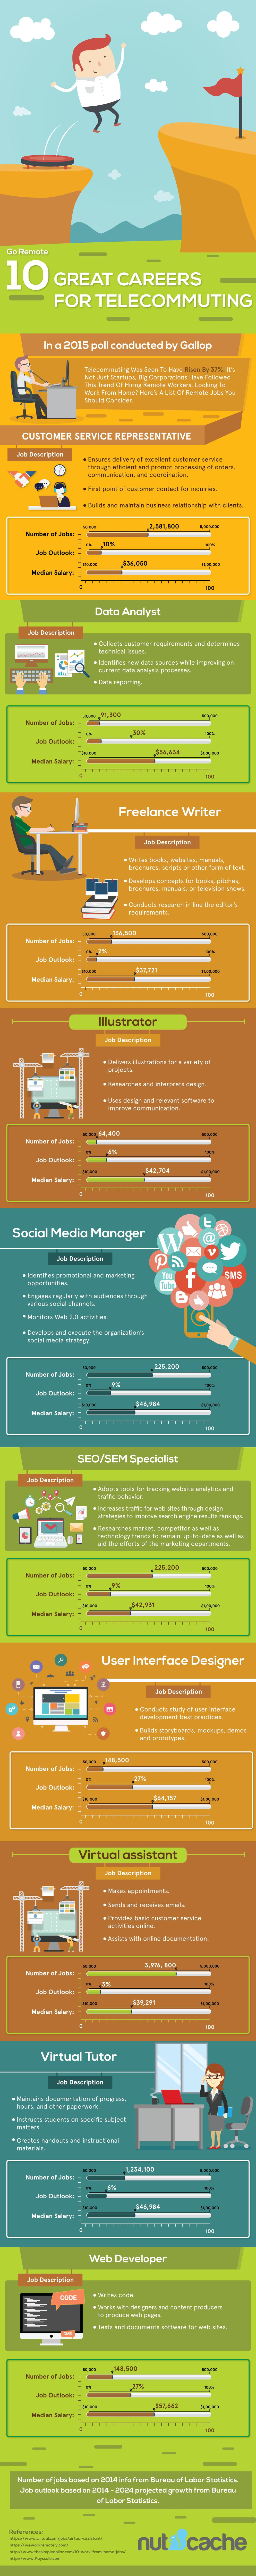 Go Remote infographic